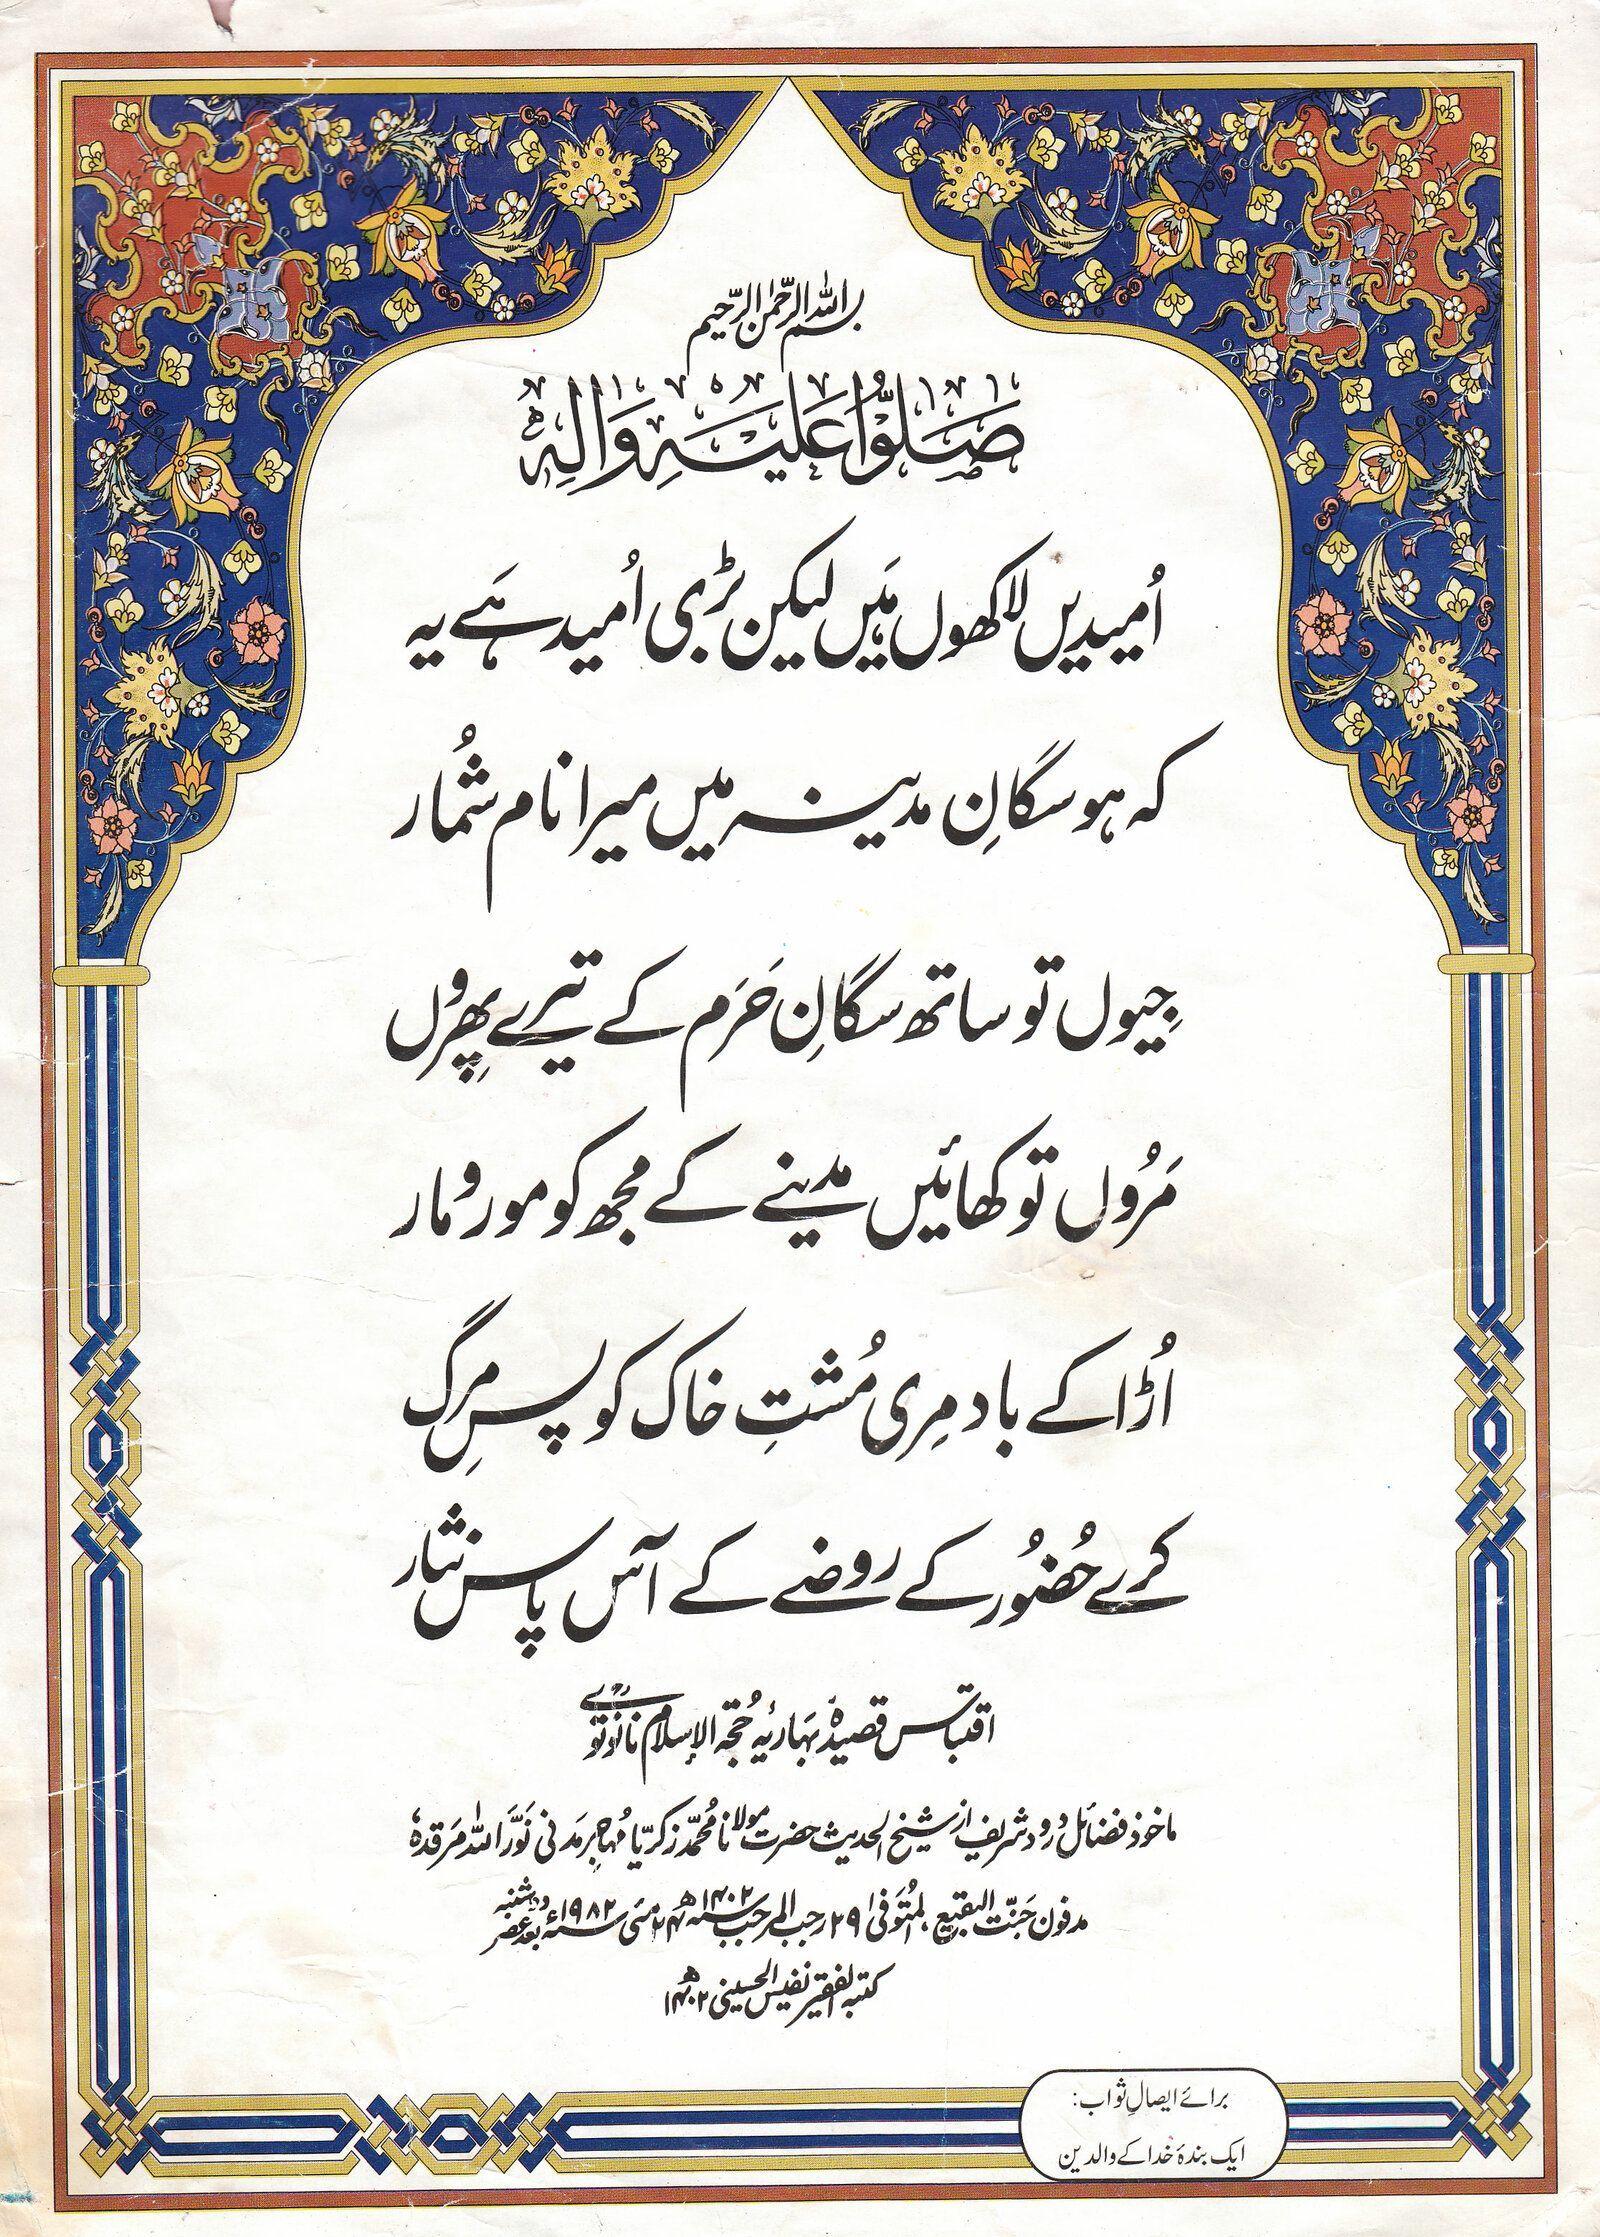 Sayed Nafees al-Hussaini - Calligraphic Work.jpg